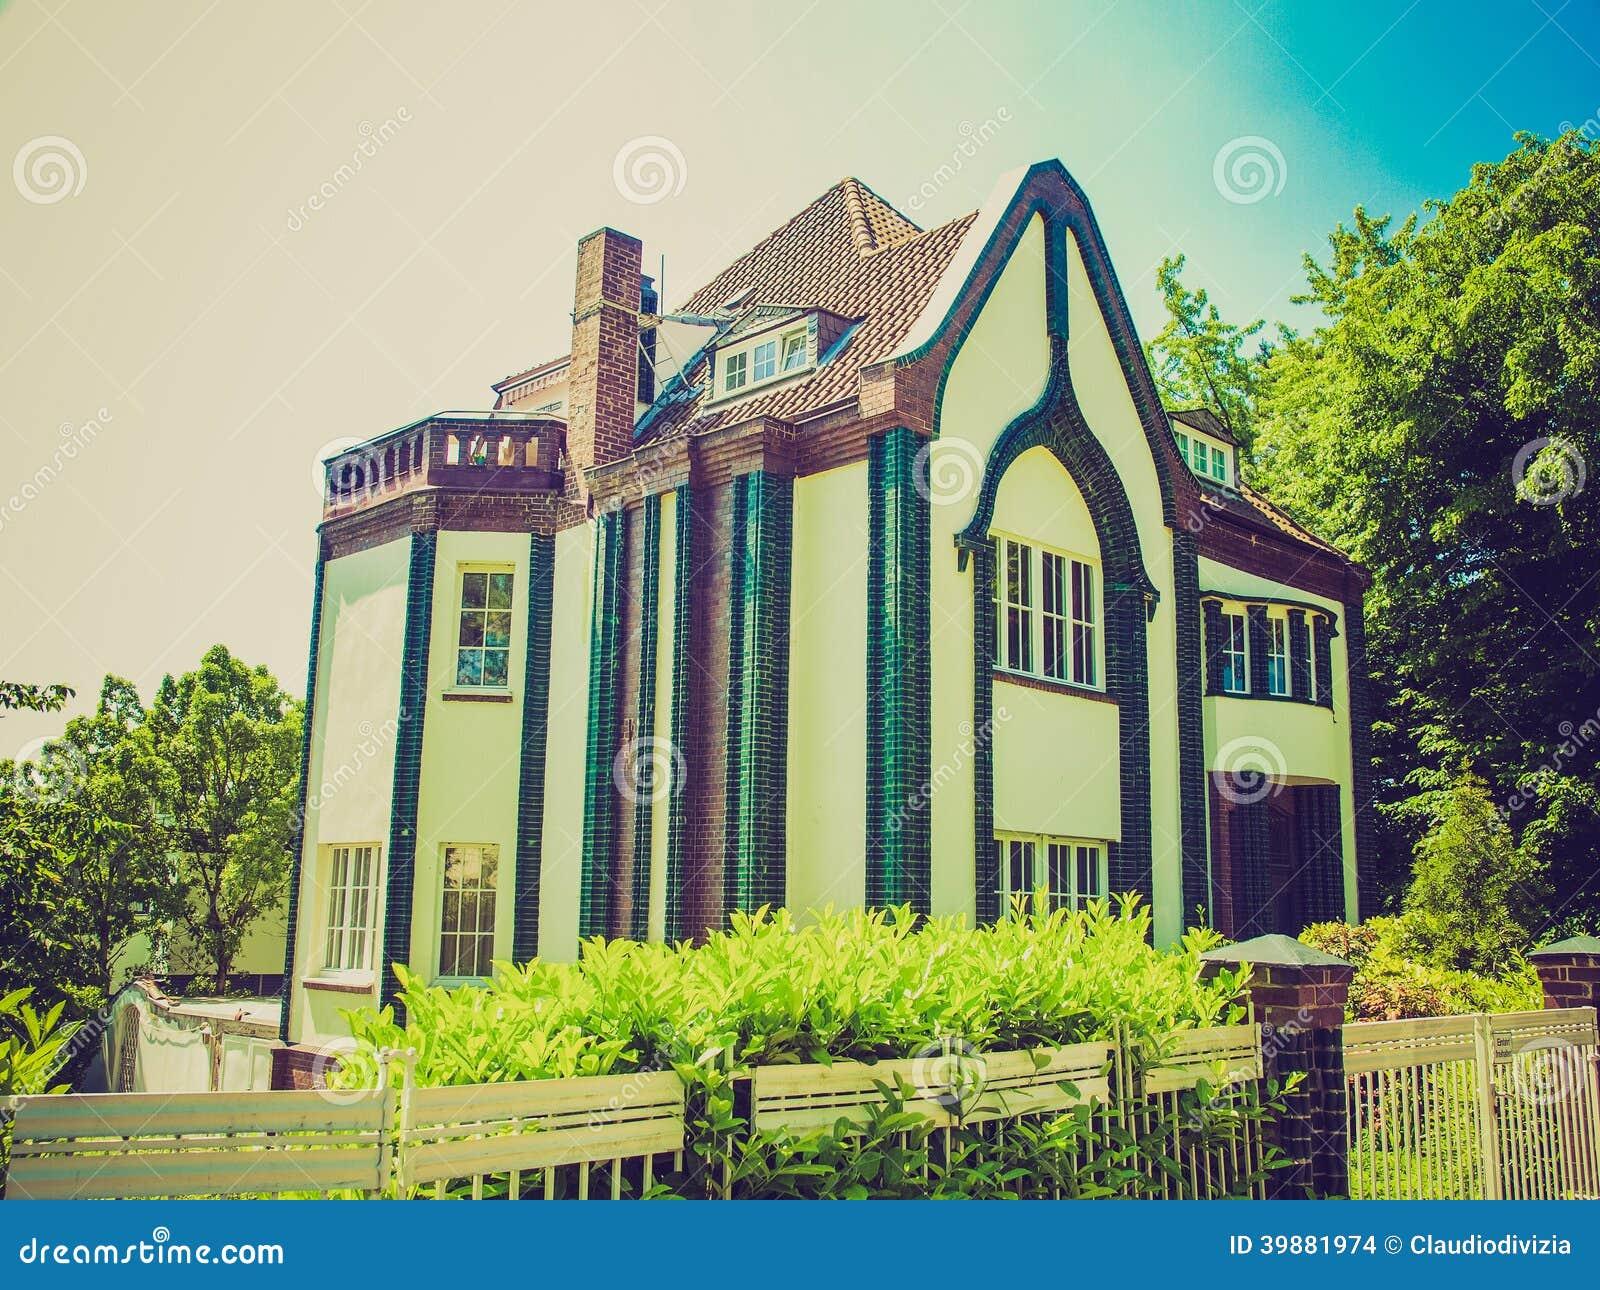 retro look behrens house in darmstadt stock photo image. Black Bedroom Furniture Sets. Home Design Ideas